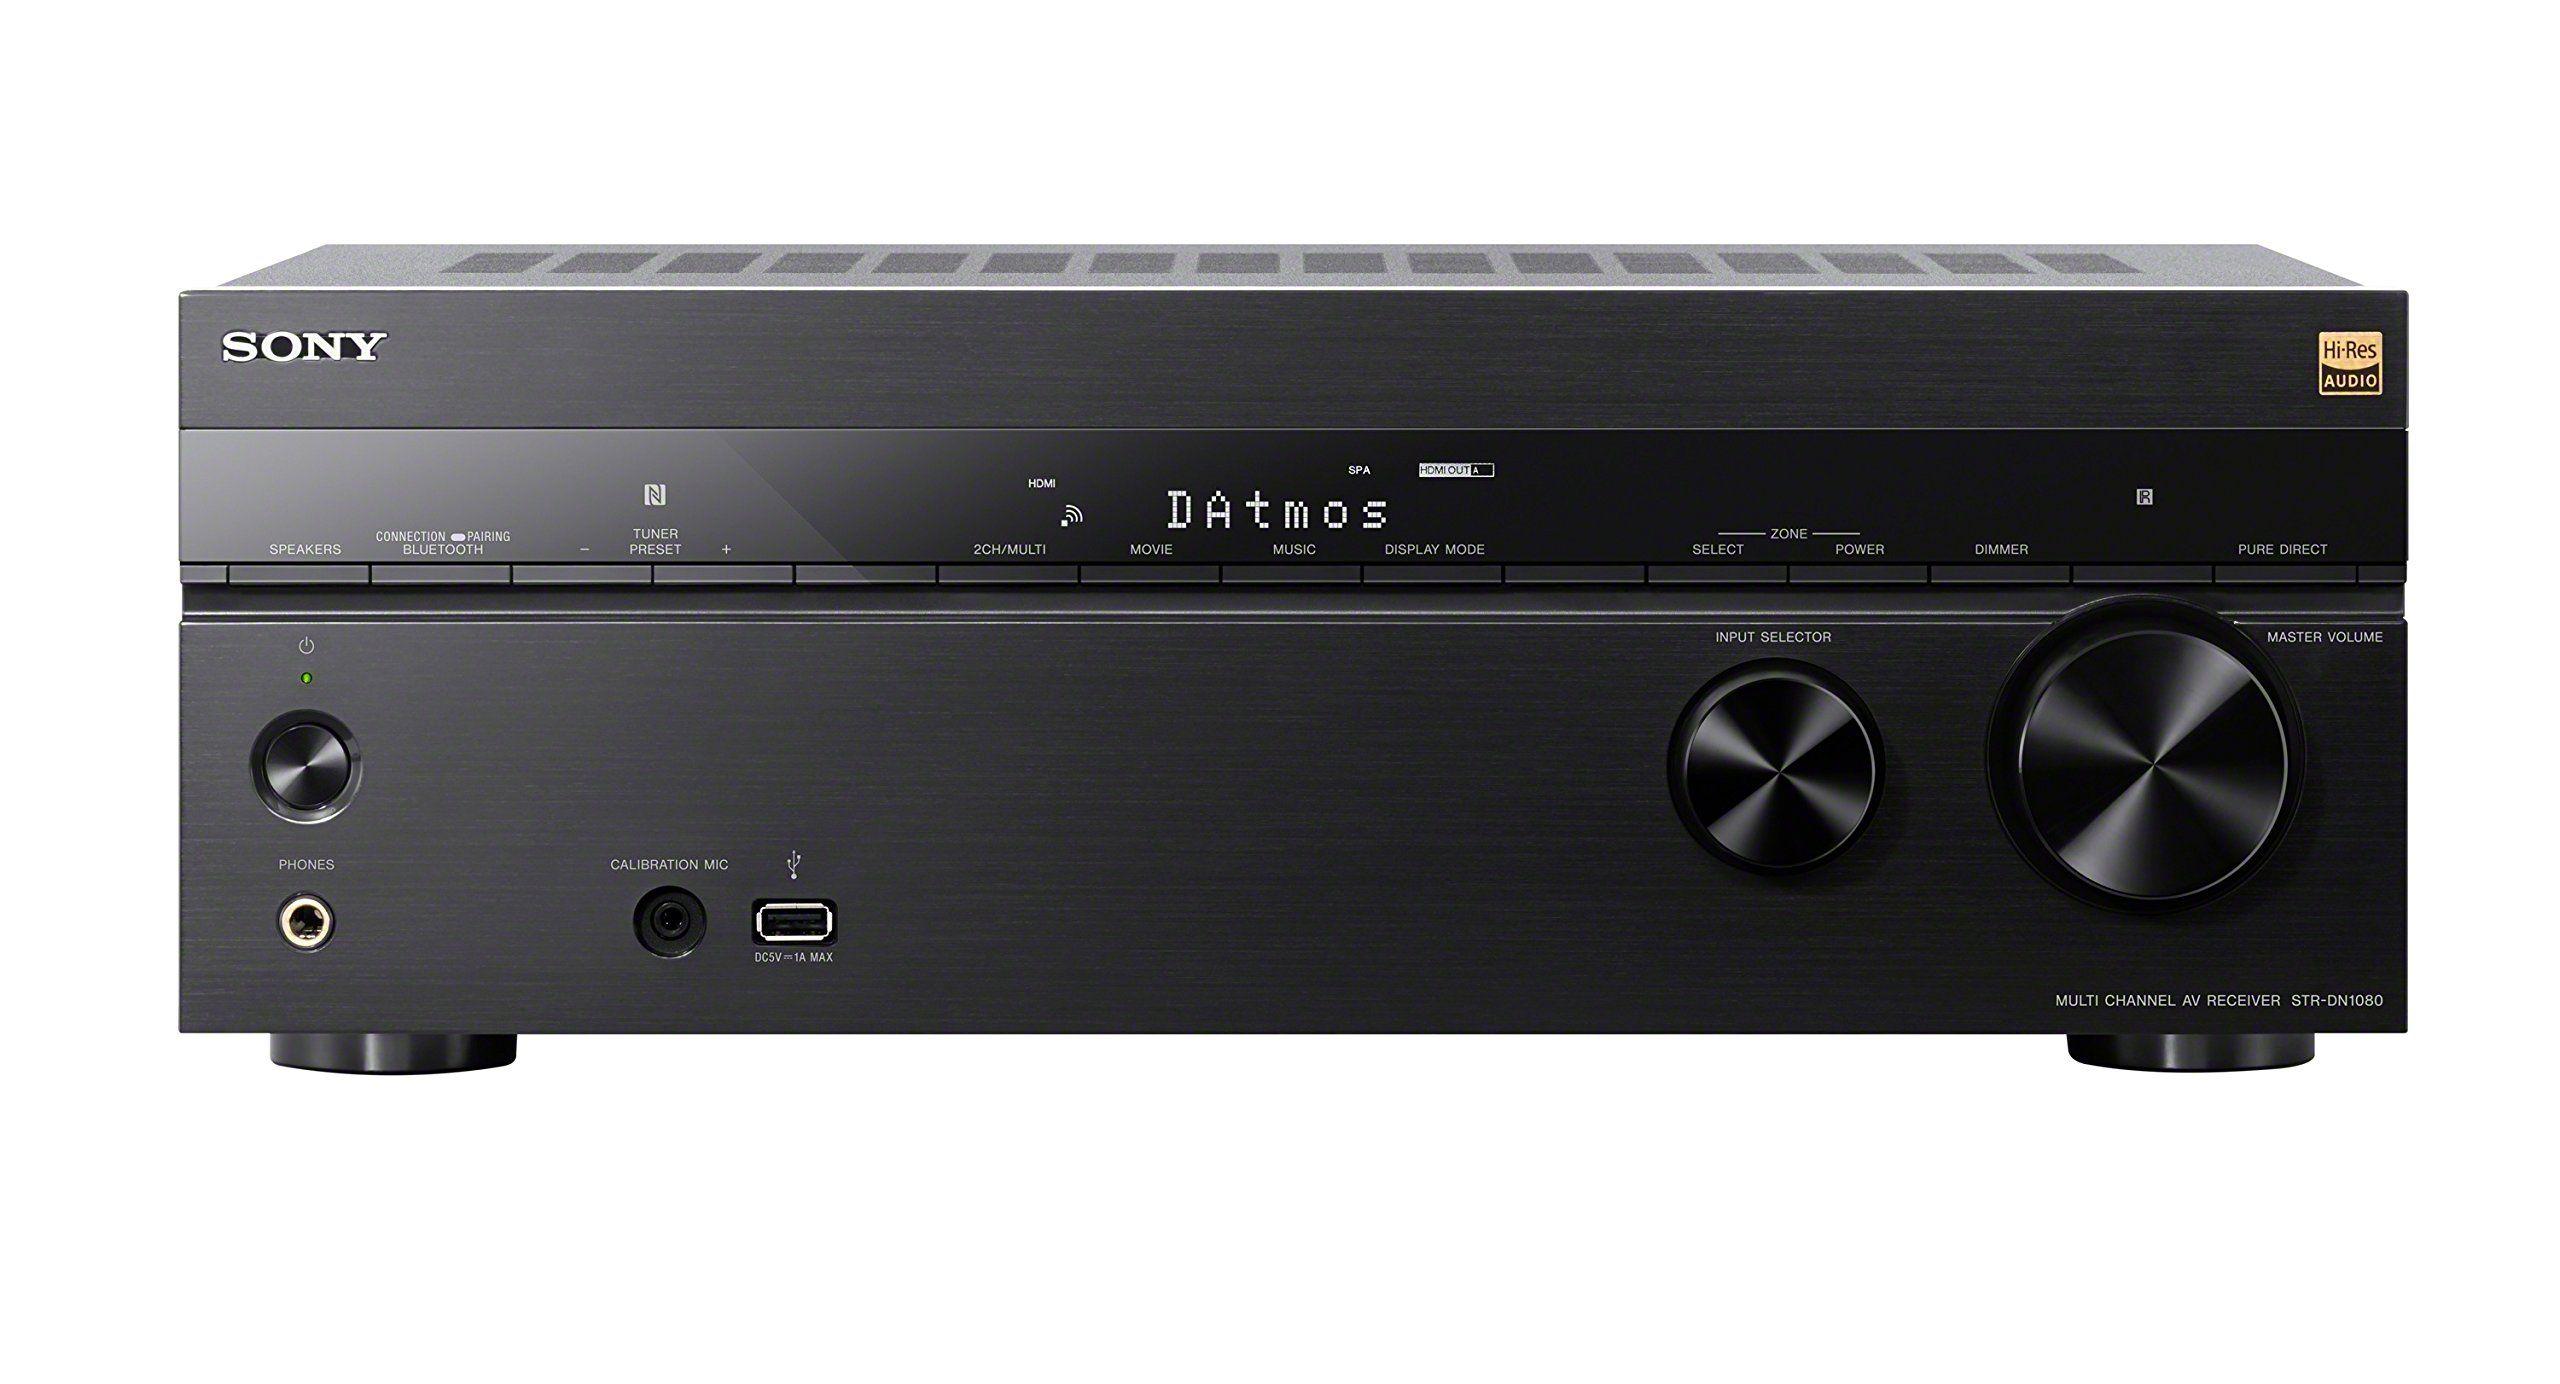 Sony STRDN1080 7.2 Channel Dolby Atmos Home Theater AV Receiver ...